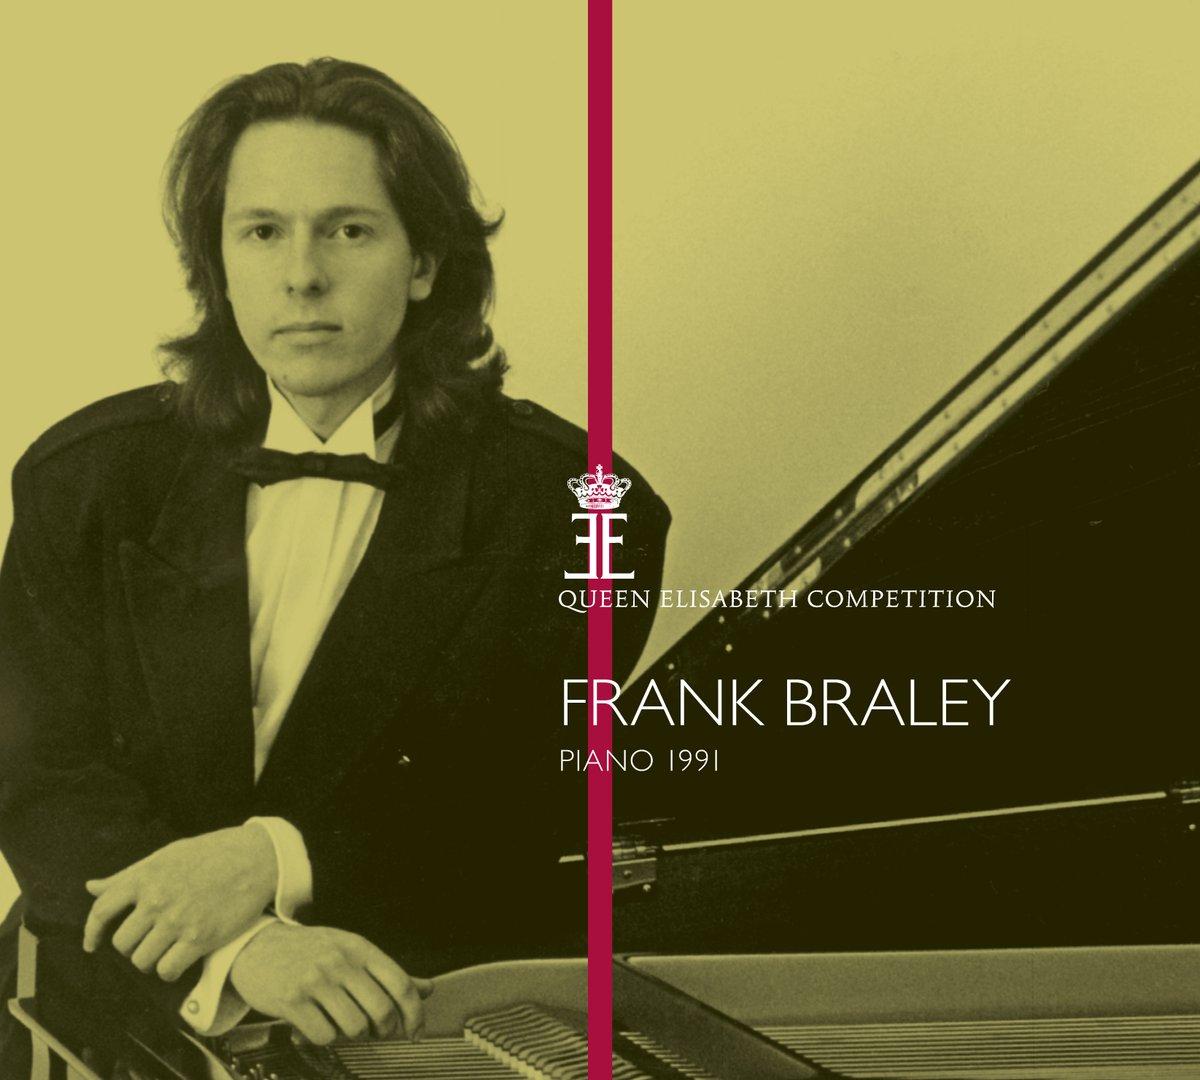 frank_braley-queen_elisabeth_competition_-_piano_1991